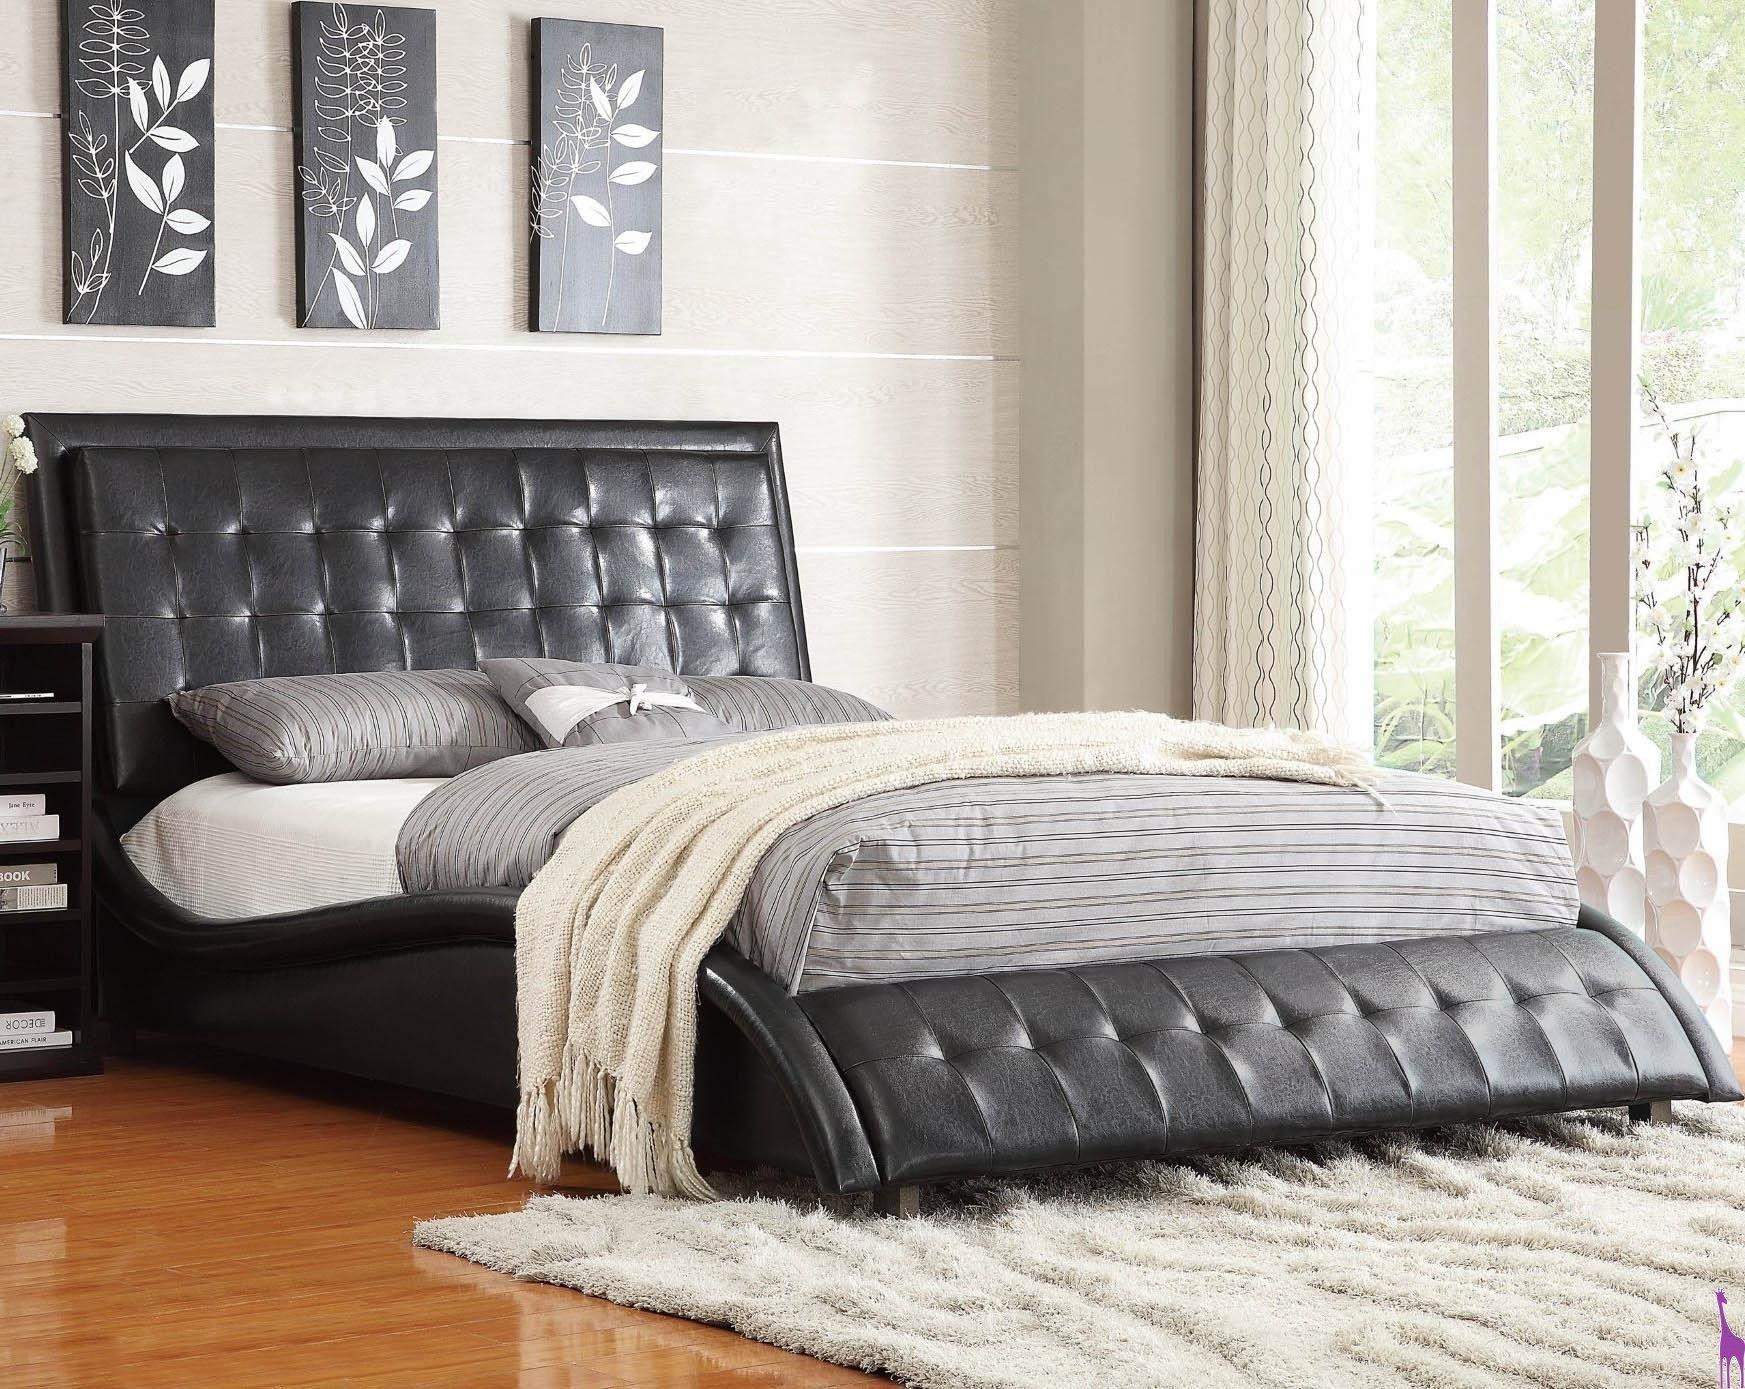 Tufted King Bedroom Set Fresh Tully Black Upholstered Bed